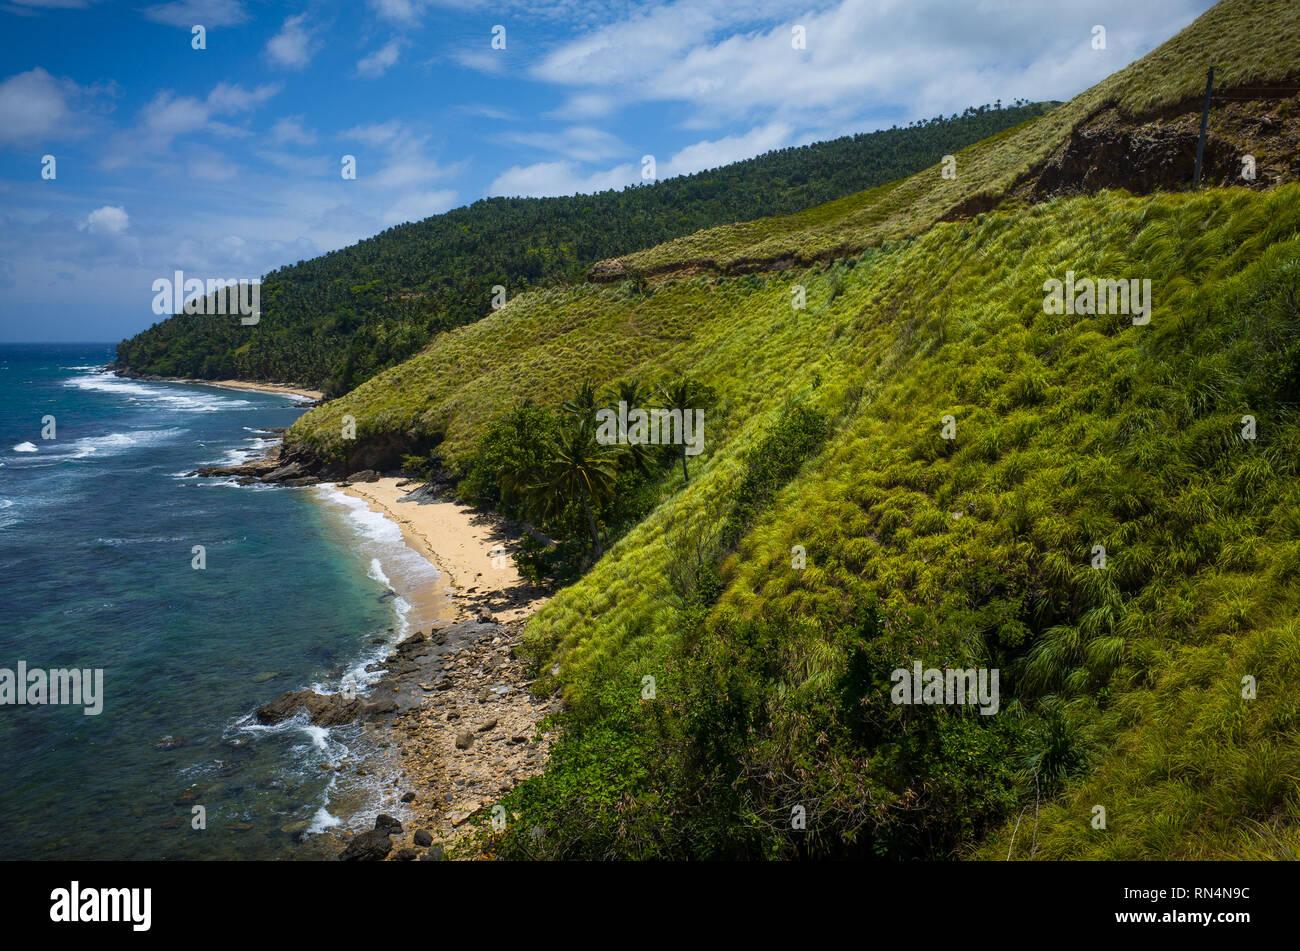 Mountain landscape with green coastal hills in Romblon, Philippines - Stock Image